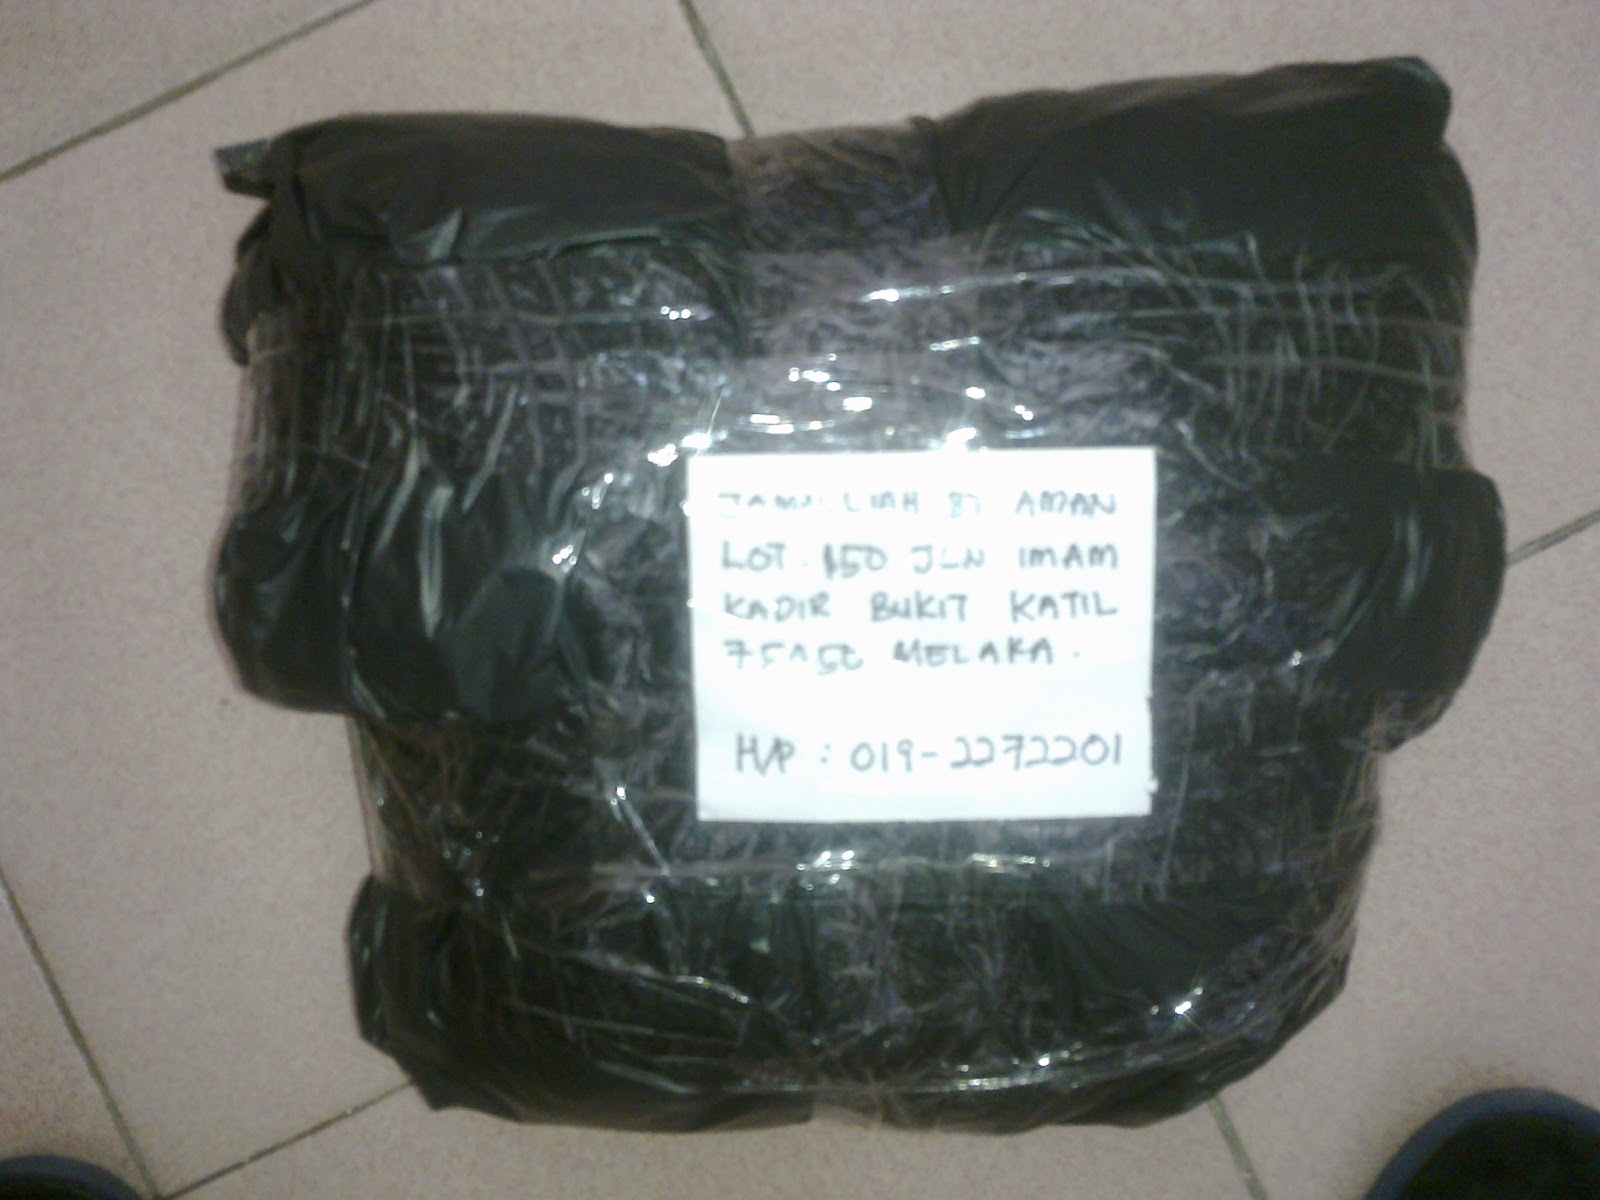 IBU KOLAGEN RUMPAI LAUT GRED...: Pembekal Rumpai laut RM35 Free 1kg...